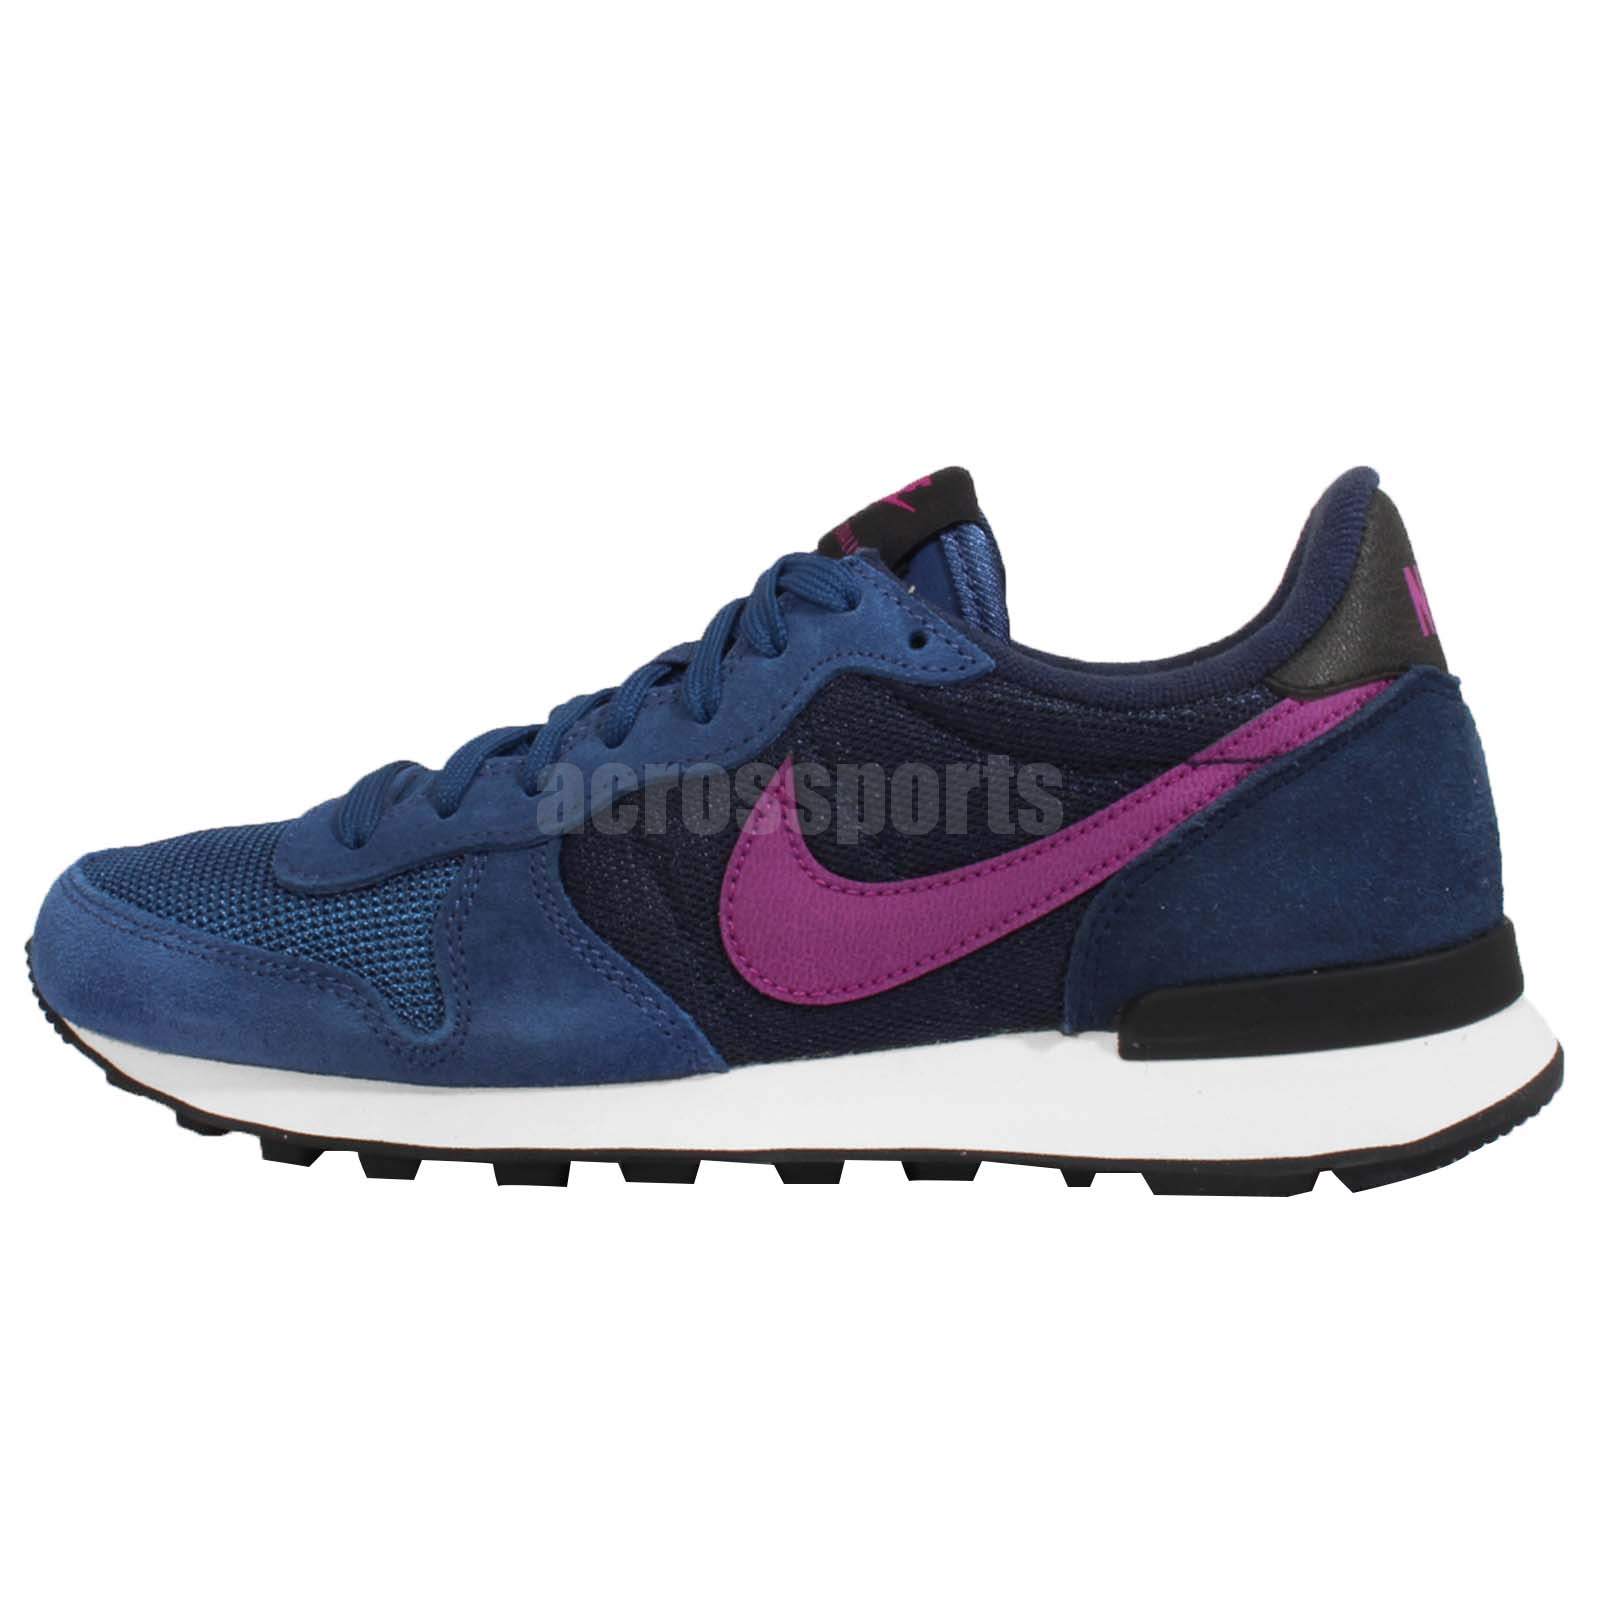 wmns nike internationalist blue purple navy womens running